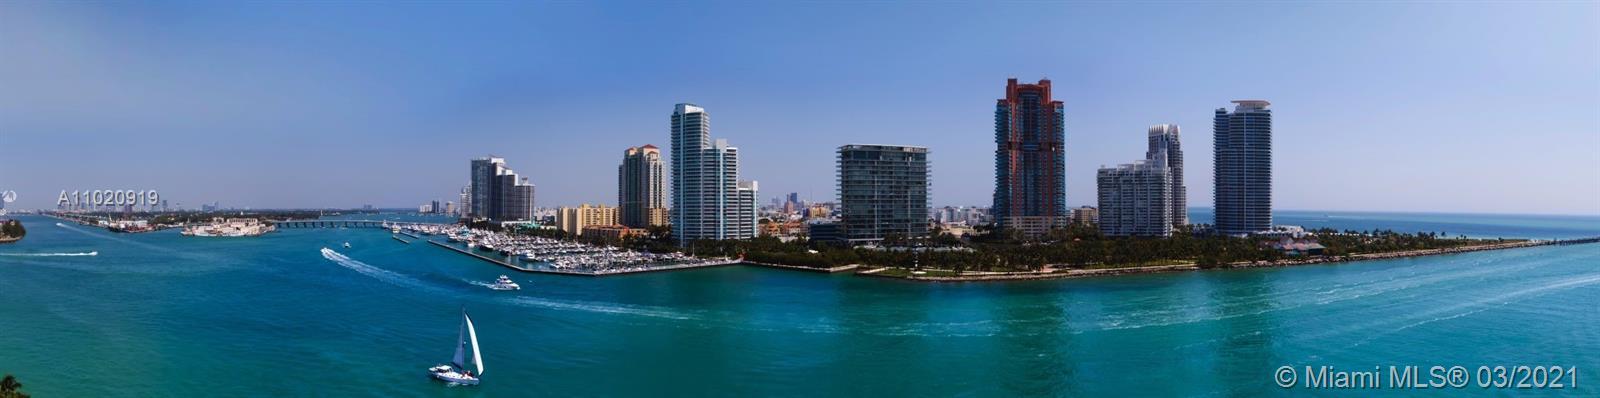 6800 Fisher island-6884 miami-beach-fl-33109-a11020919-Pic01